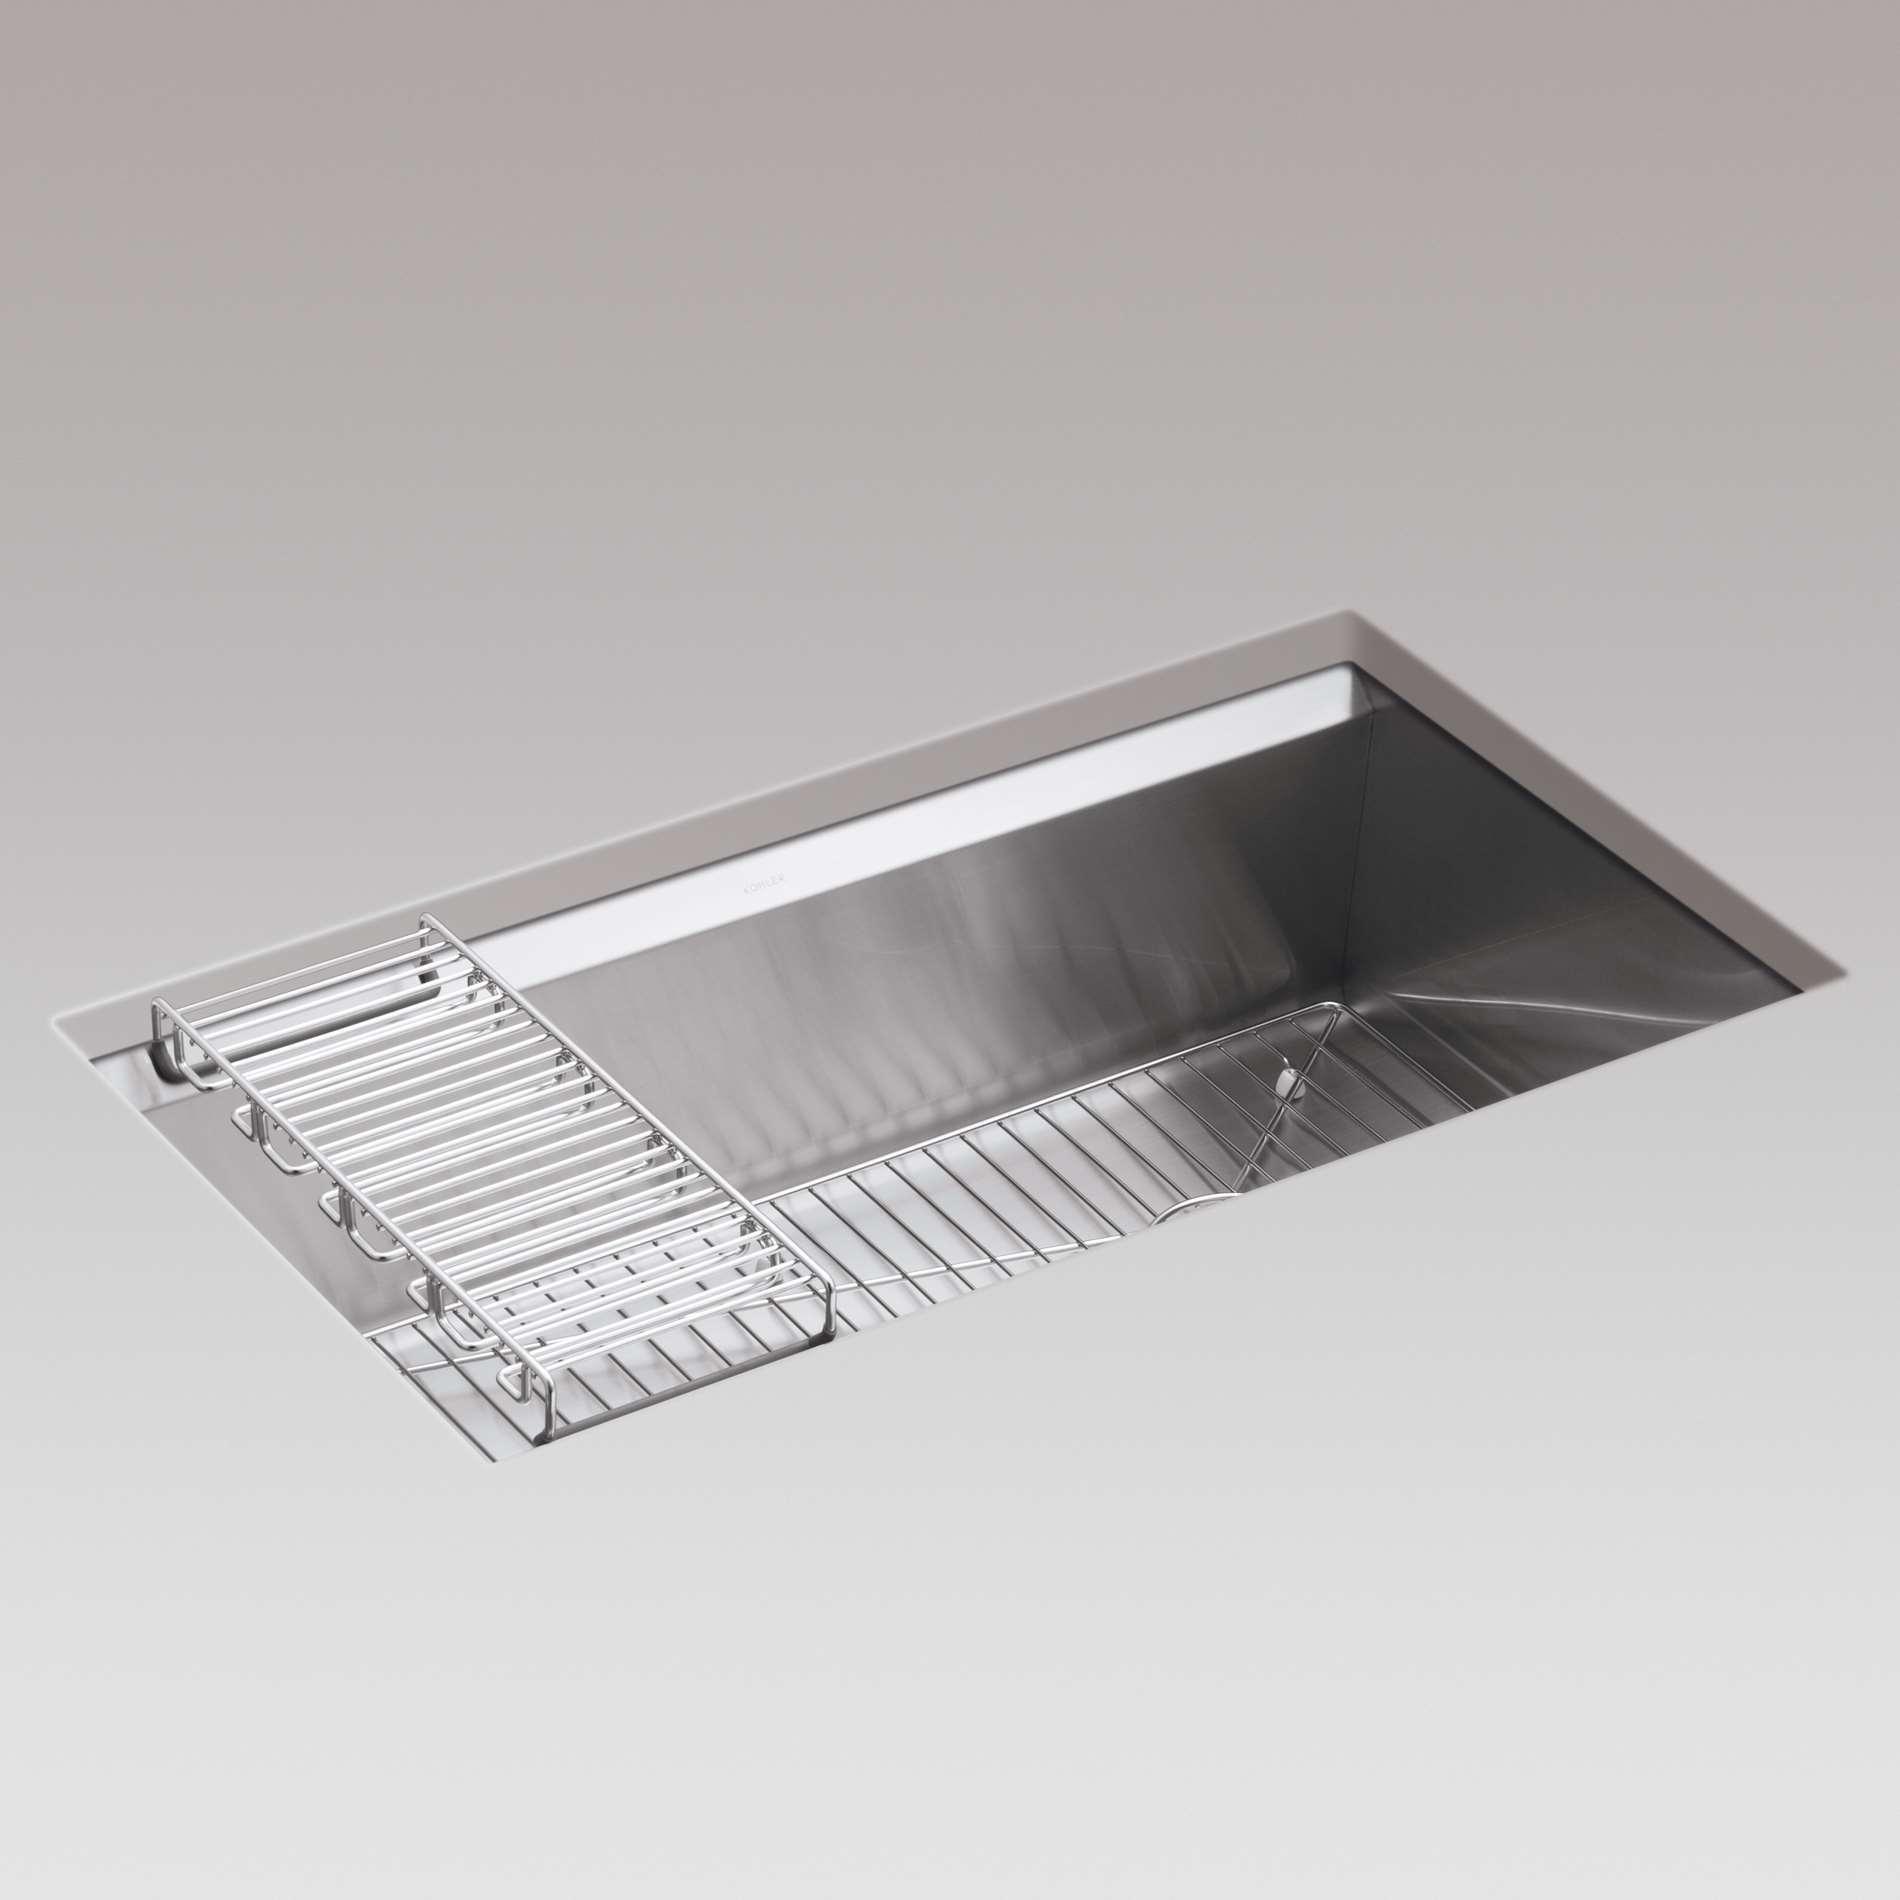 Kitchen Sinks & Taps - Kohler: 8 Degree 3673 Professional Single bowl